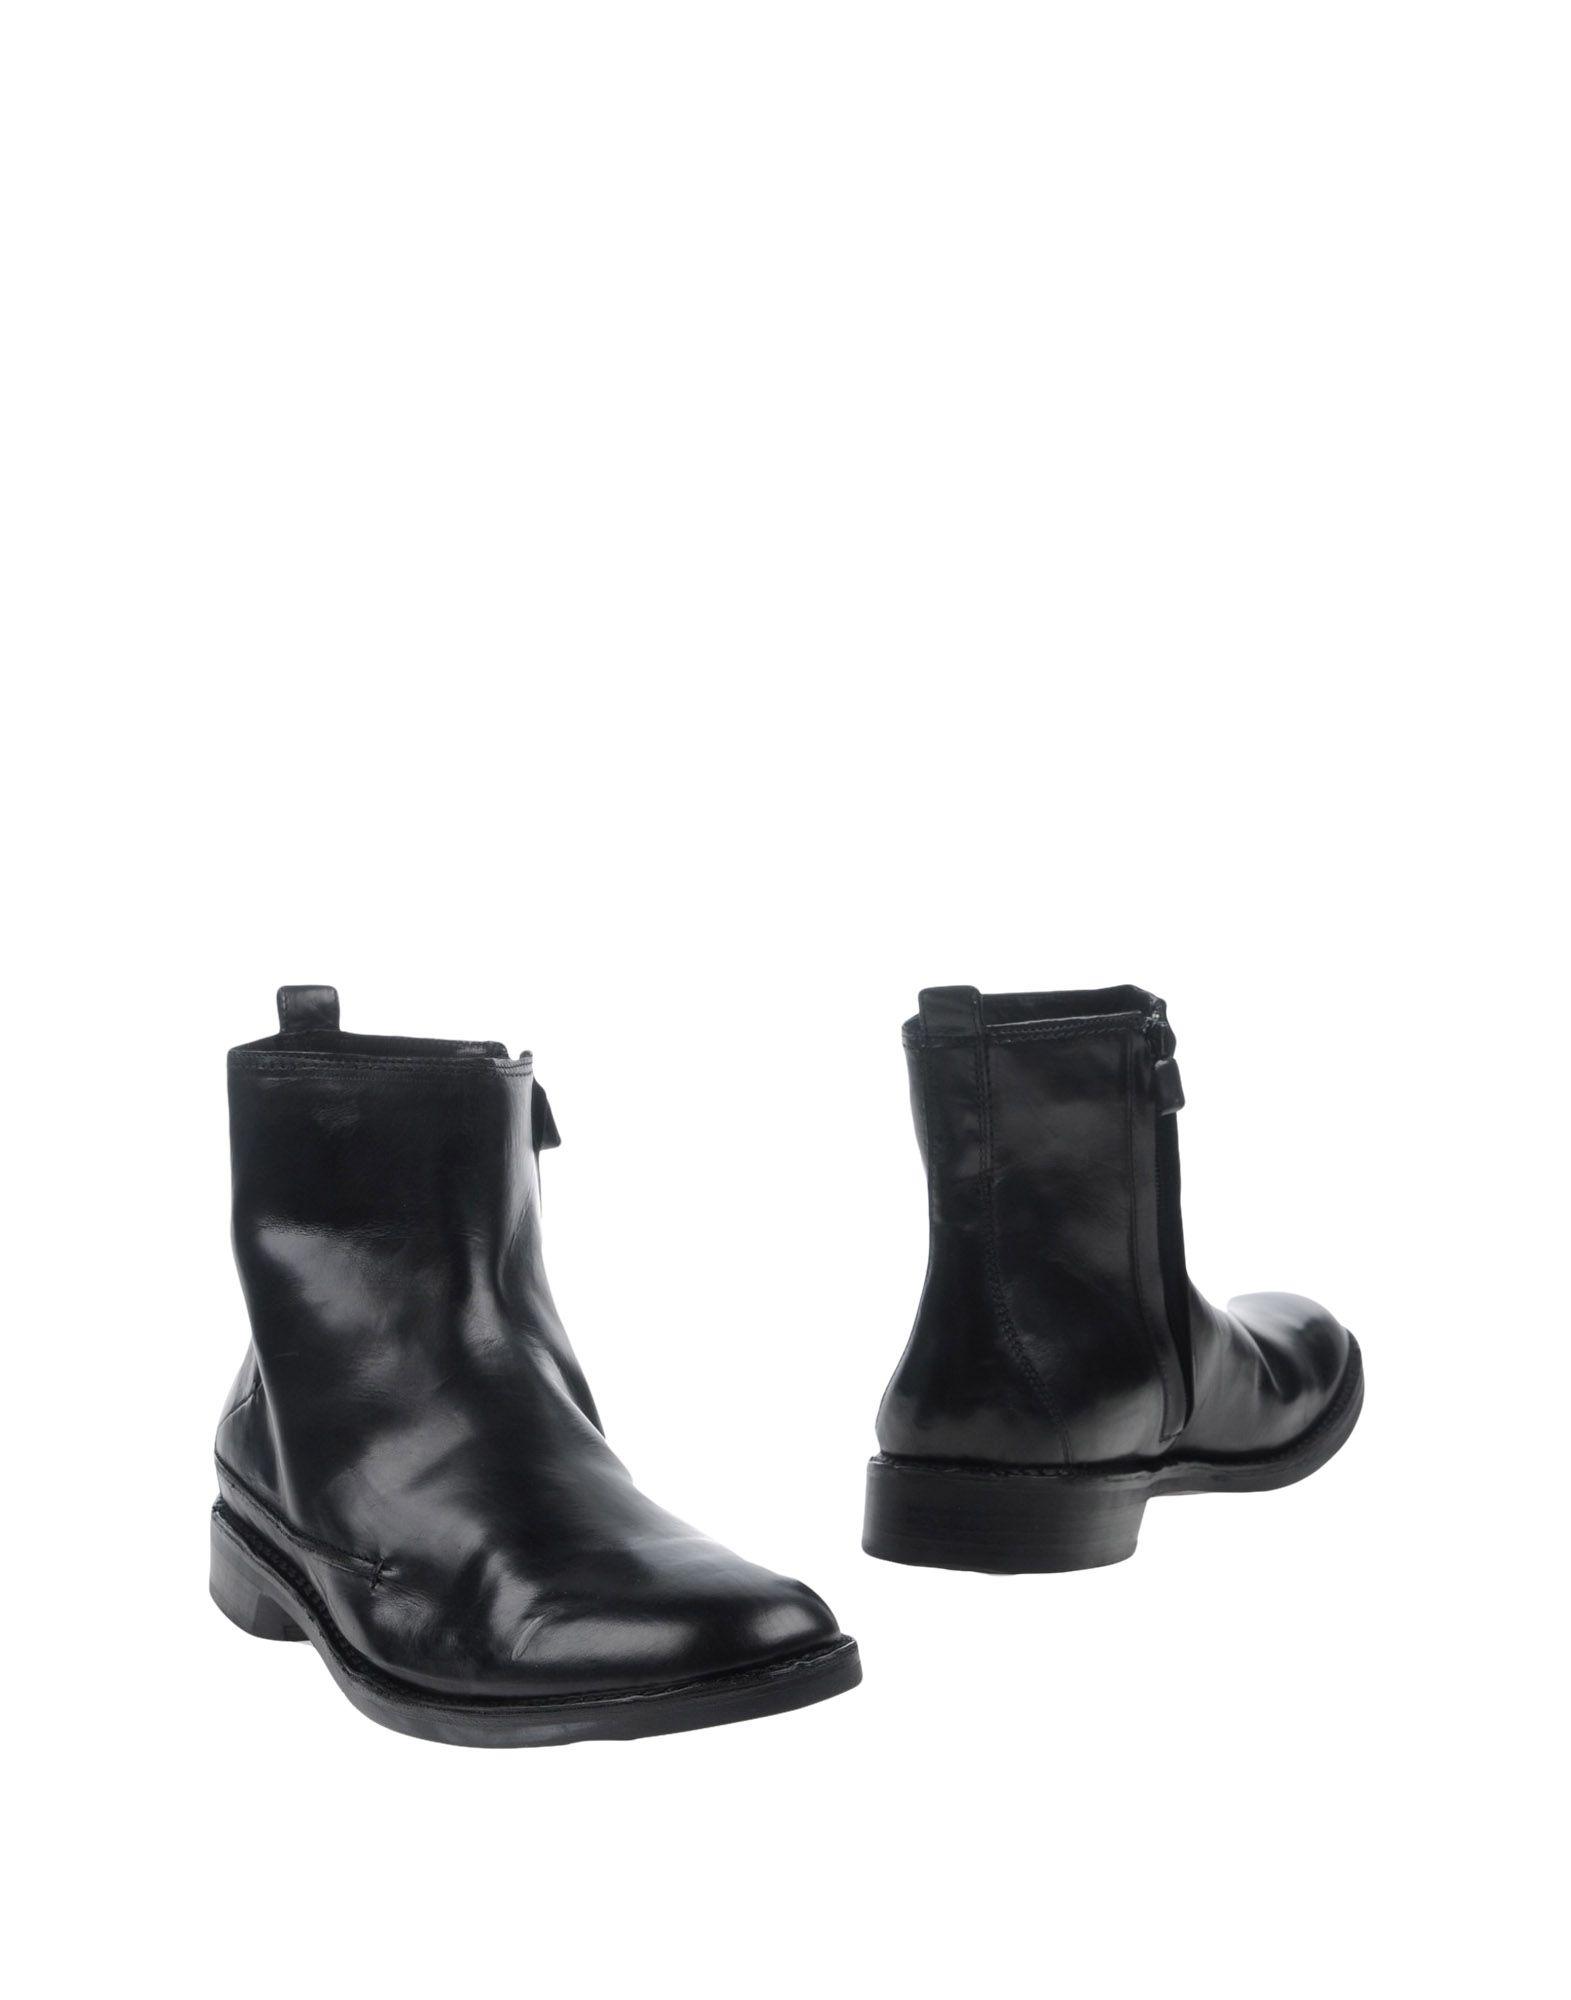 COSTUME NATIONAL HOMME Полусапоги и высокие ботинки цены онлайн